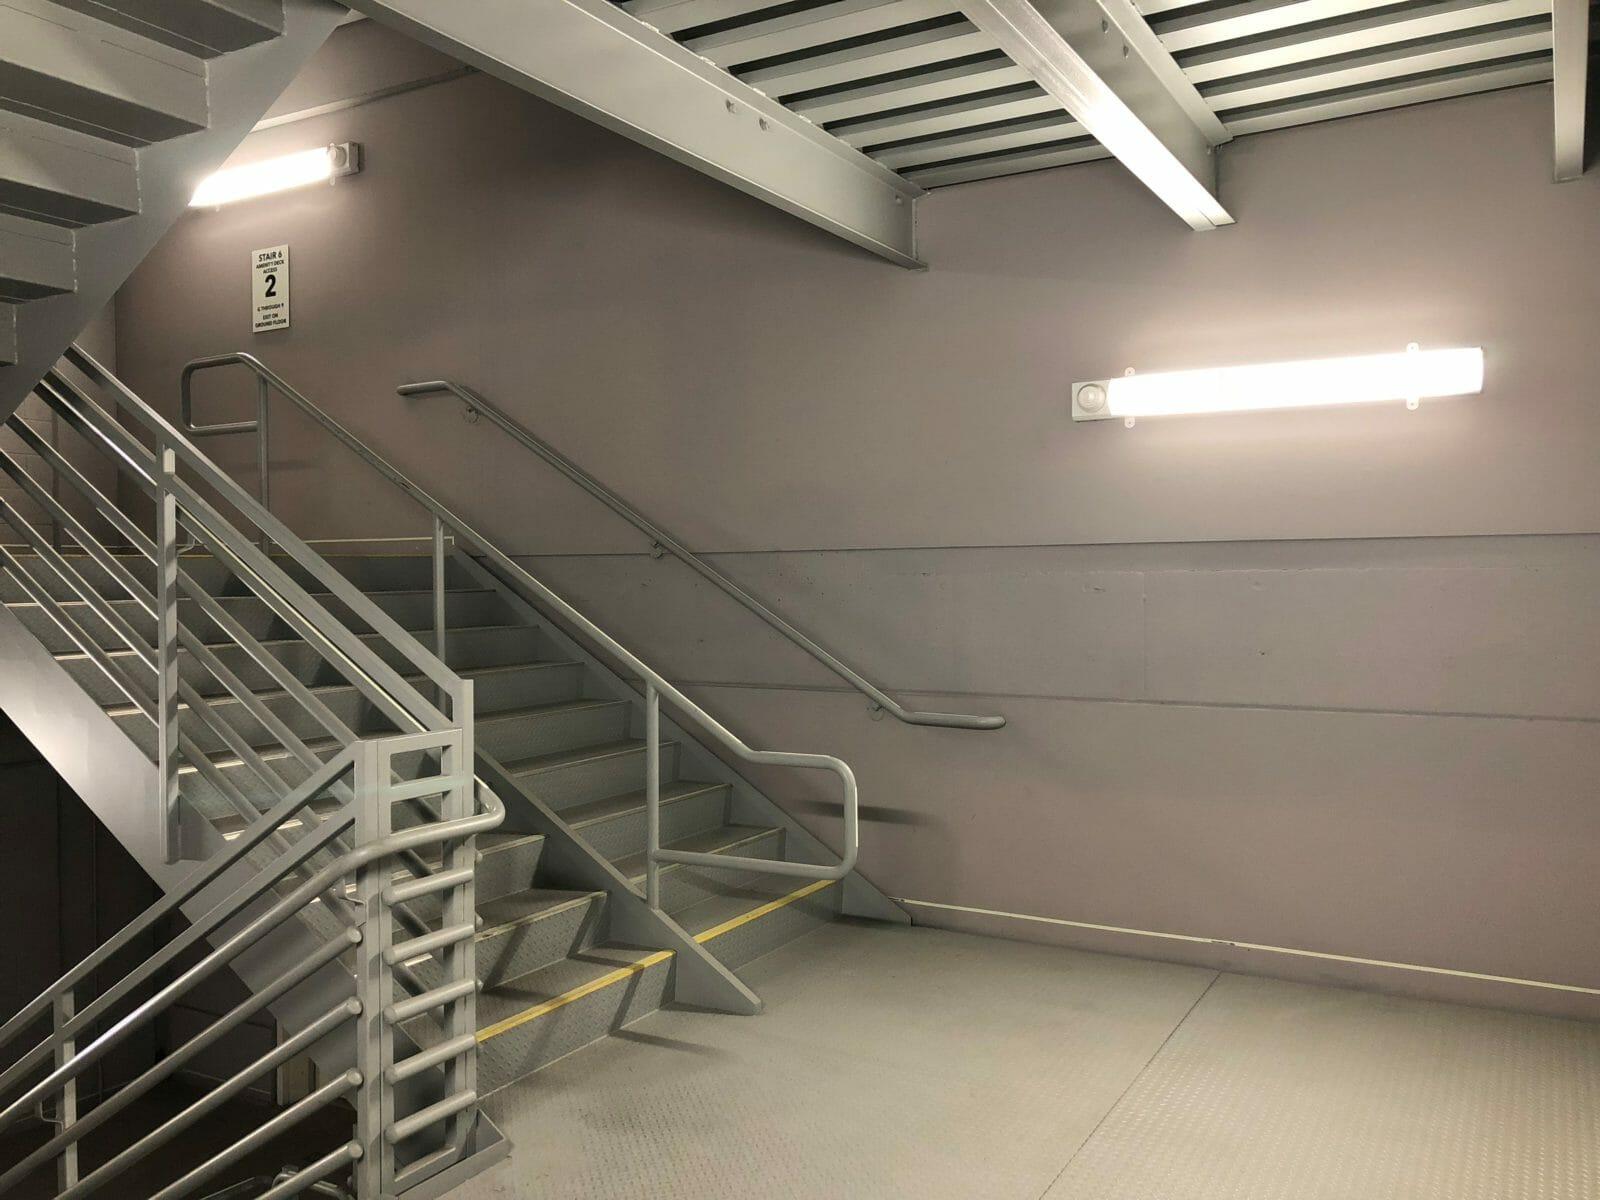 Bi-level LED Stairwell or Garage Light with Programmable Motion Sensor - Damp Location - 4FT - 25W - 3000 Lumens